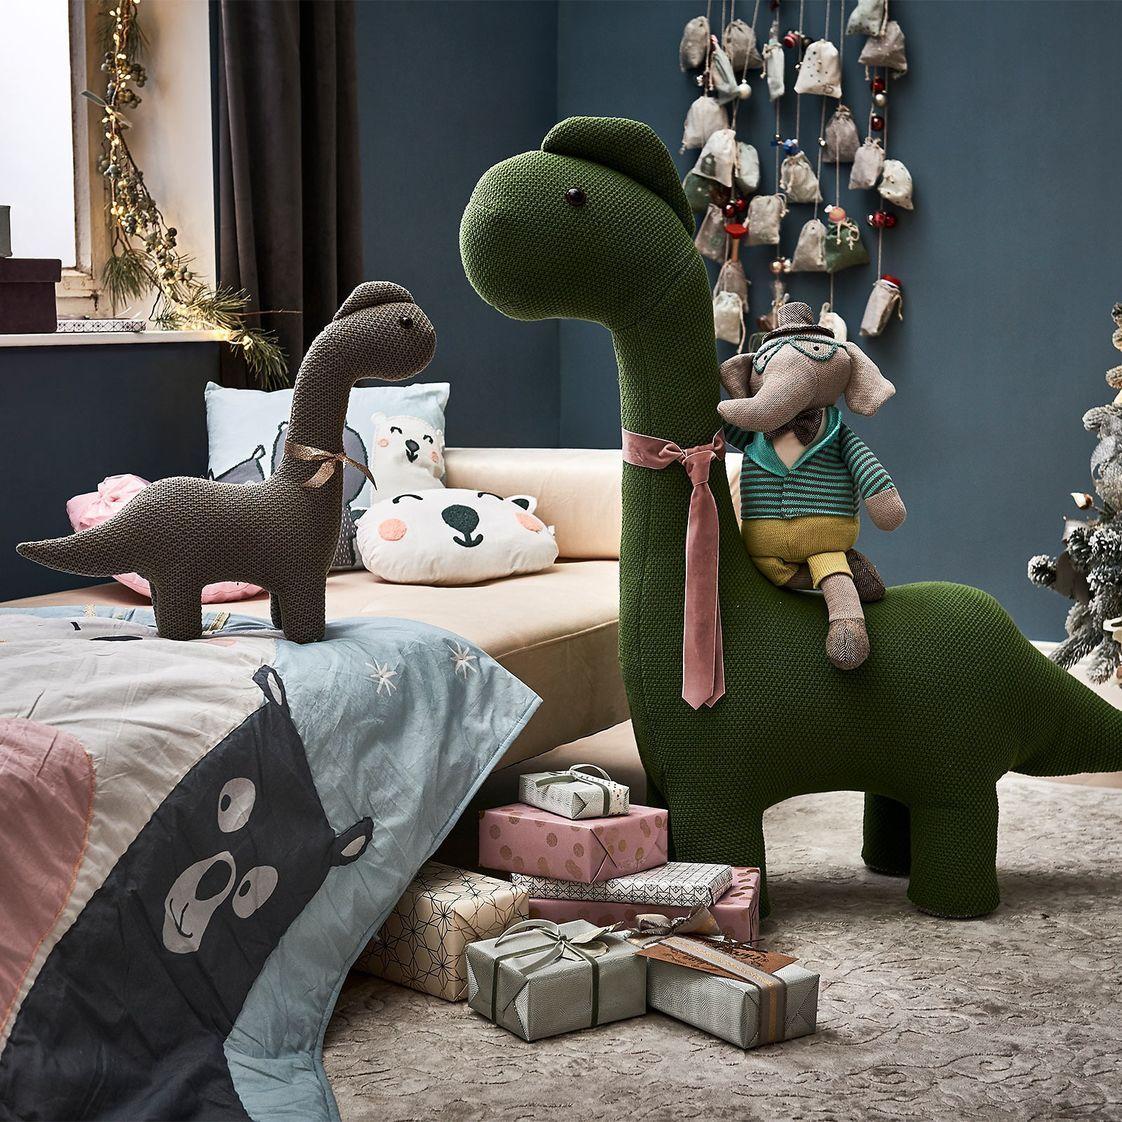 Hocker Dino, 92x28x105cm, grün Kinderzimmer deko, Kinder